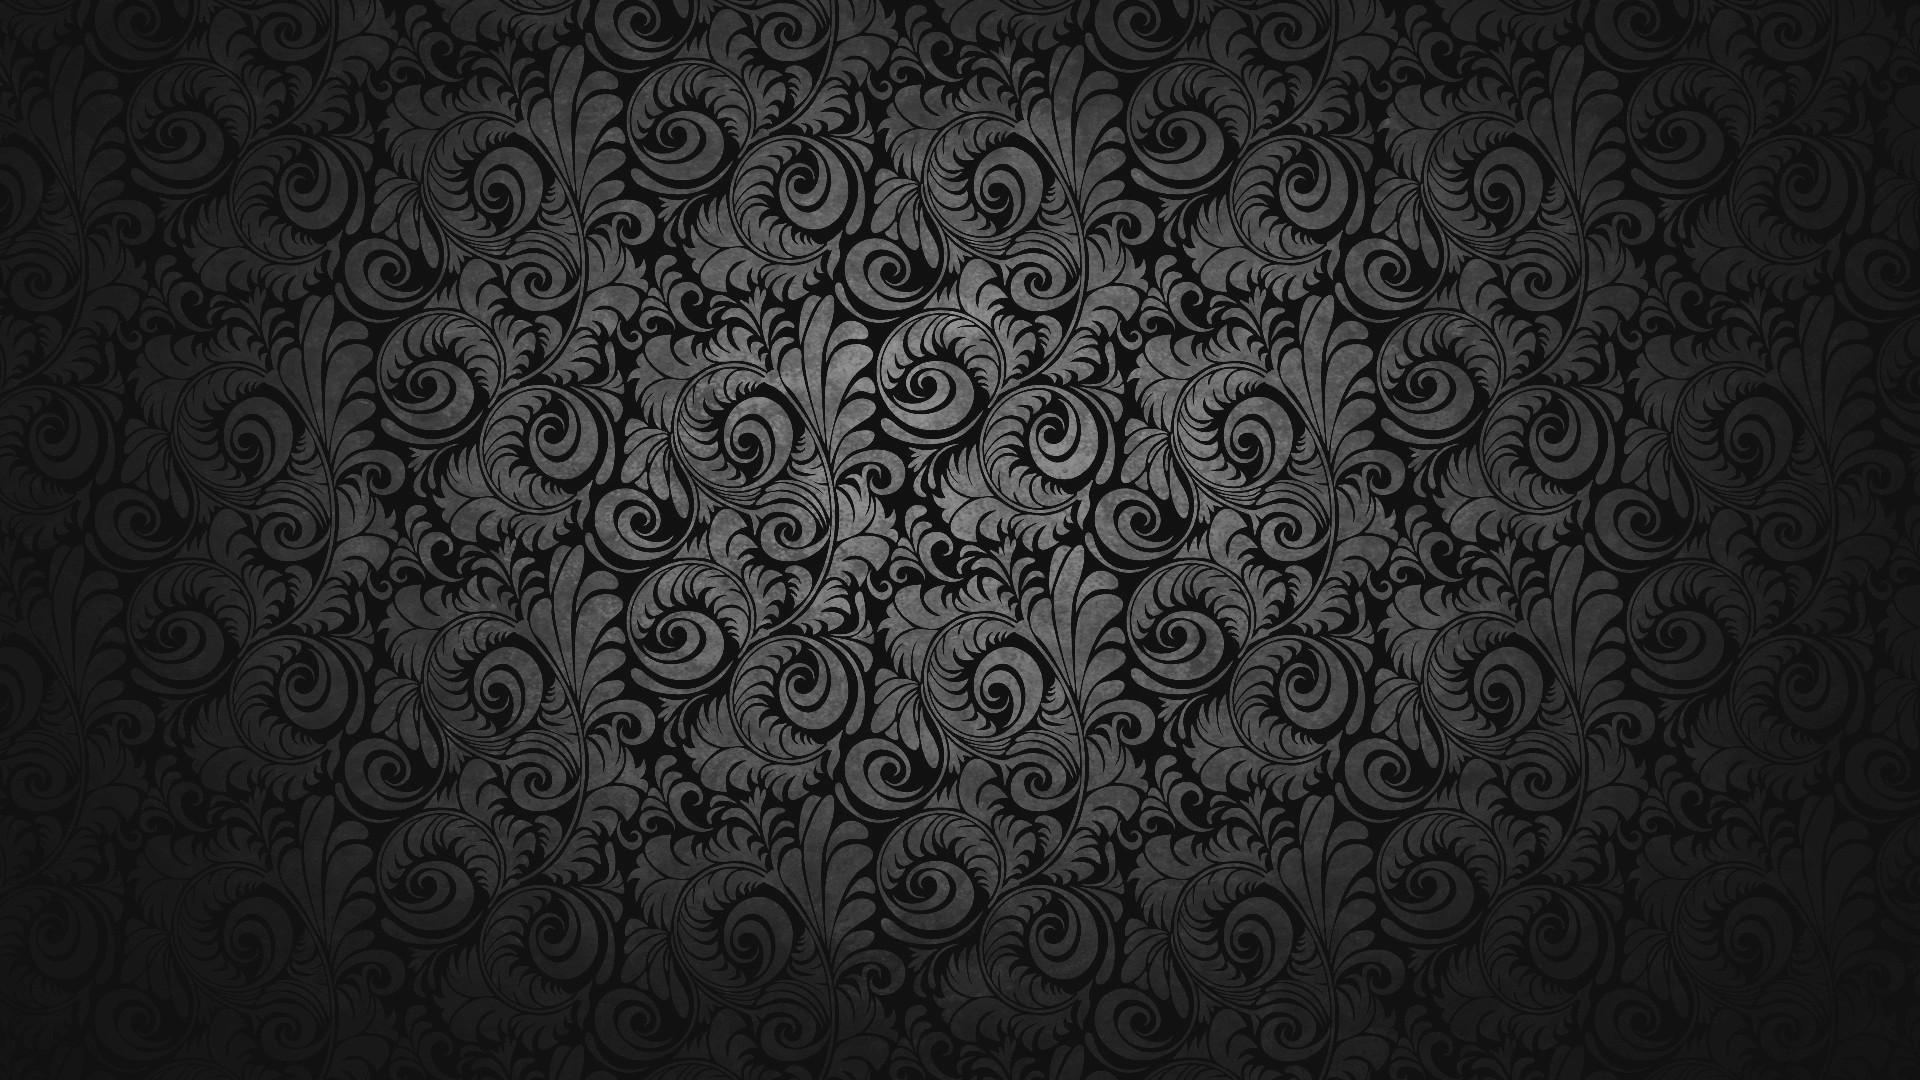 black abstract hd wallpaper 1080pjpg inktart 1920x1080